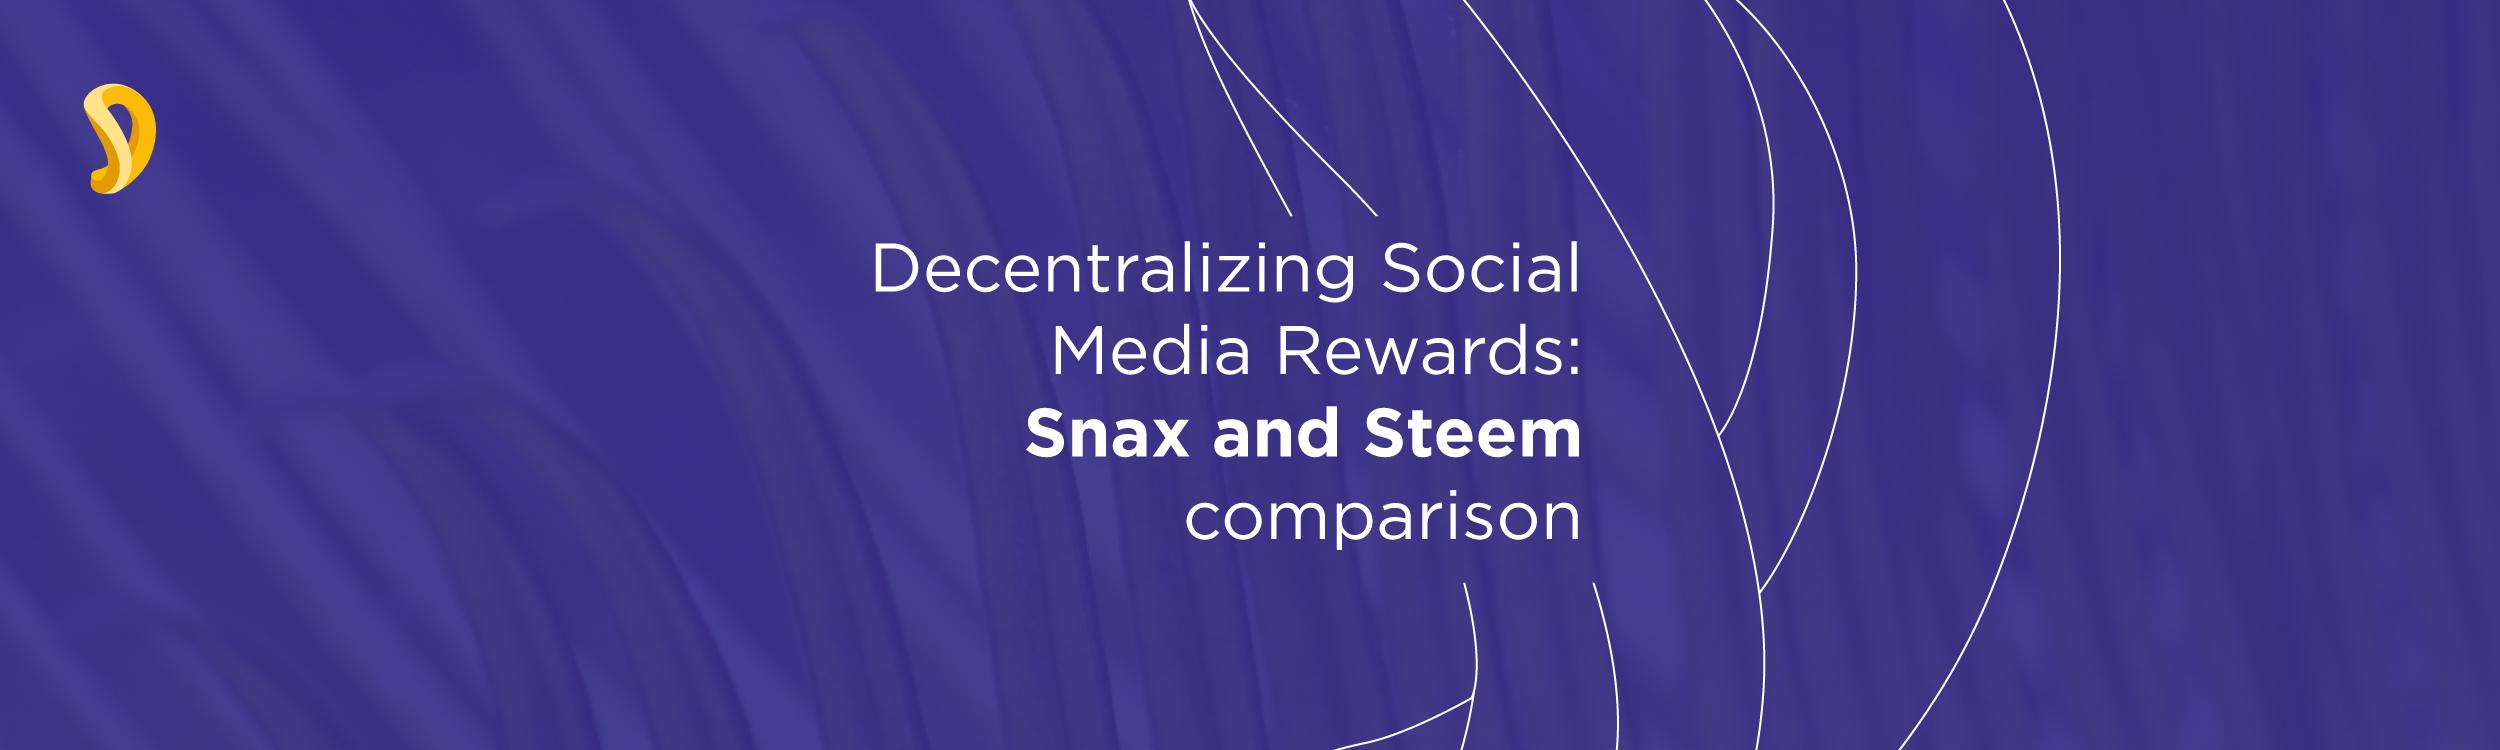 /decentralizing-social-media-rewards-steem-and-snax-comparison-ac17201824cc feature image